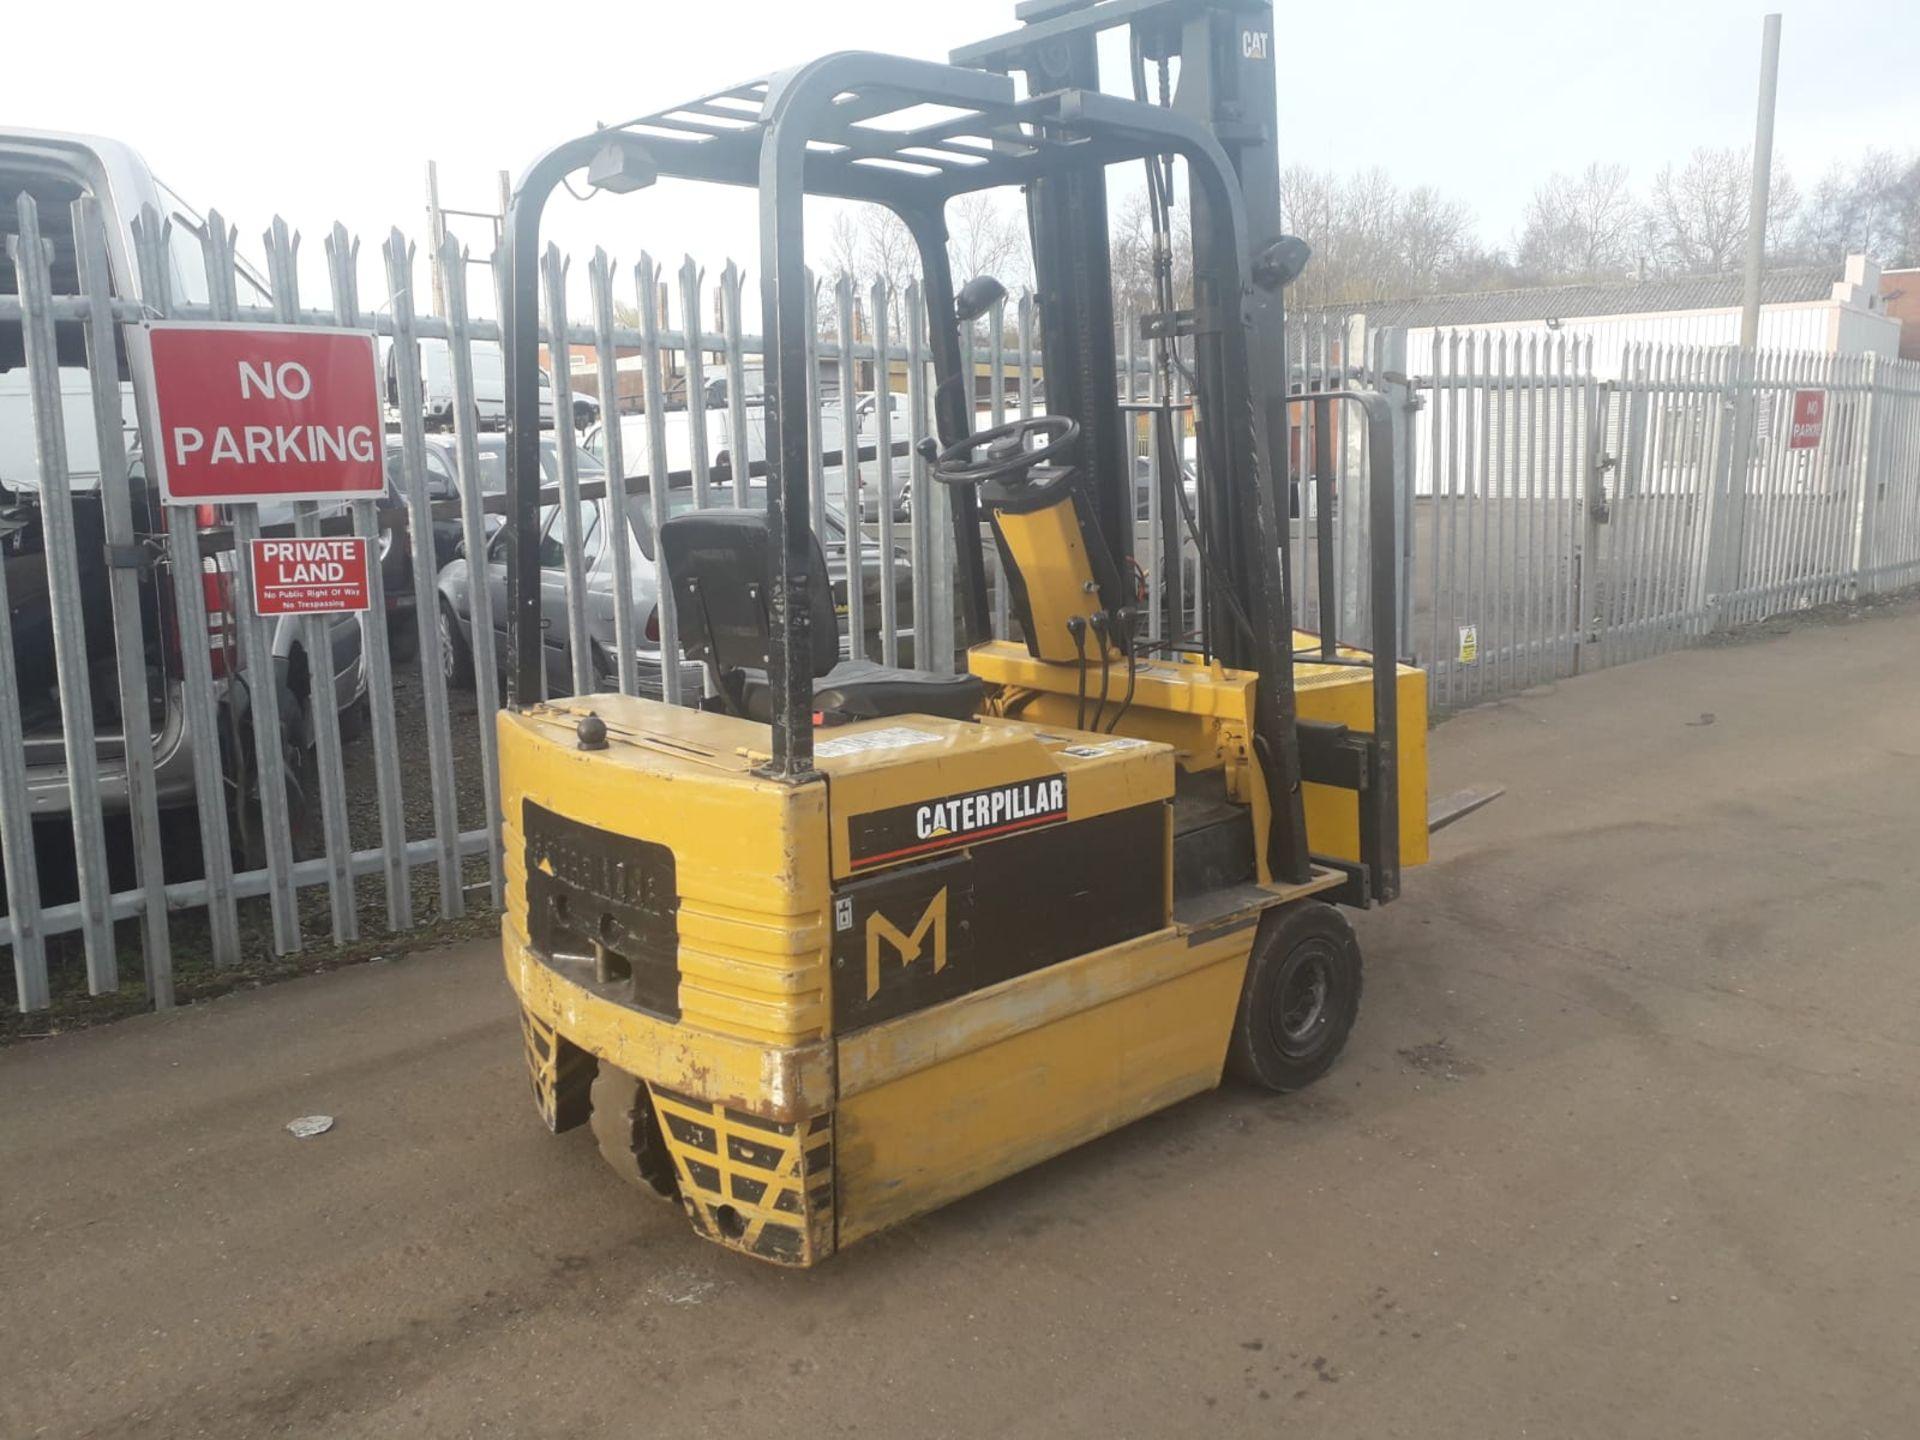 Lot 126 - Caterpillar 1.5 Tonne Electric 3 Wheel Forklift